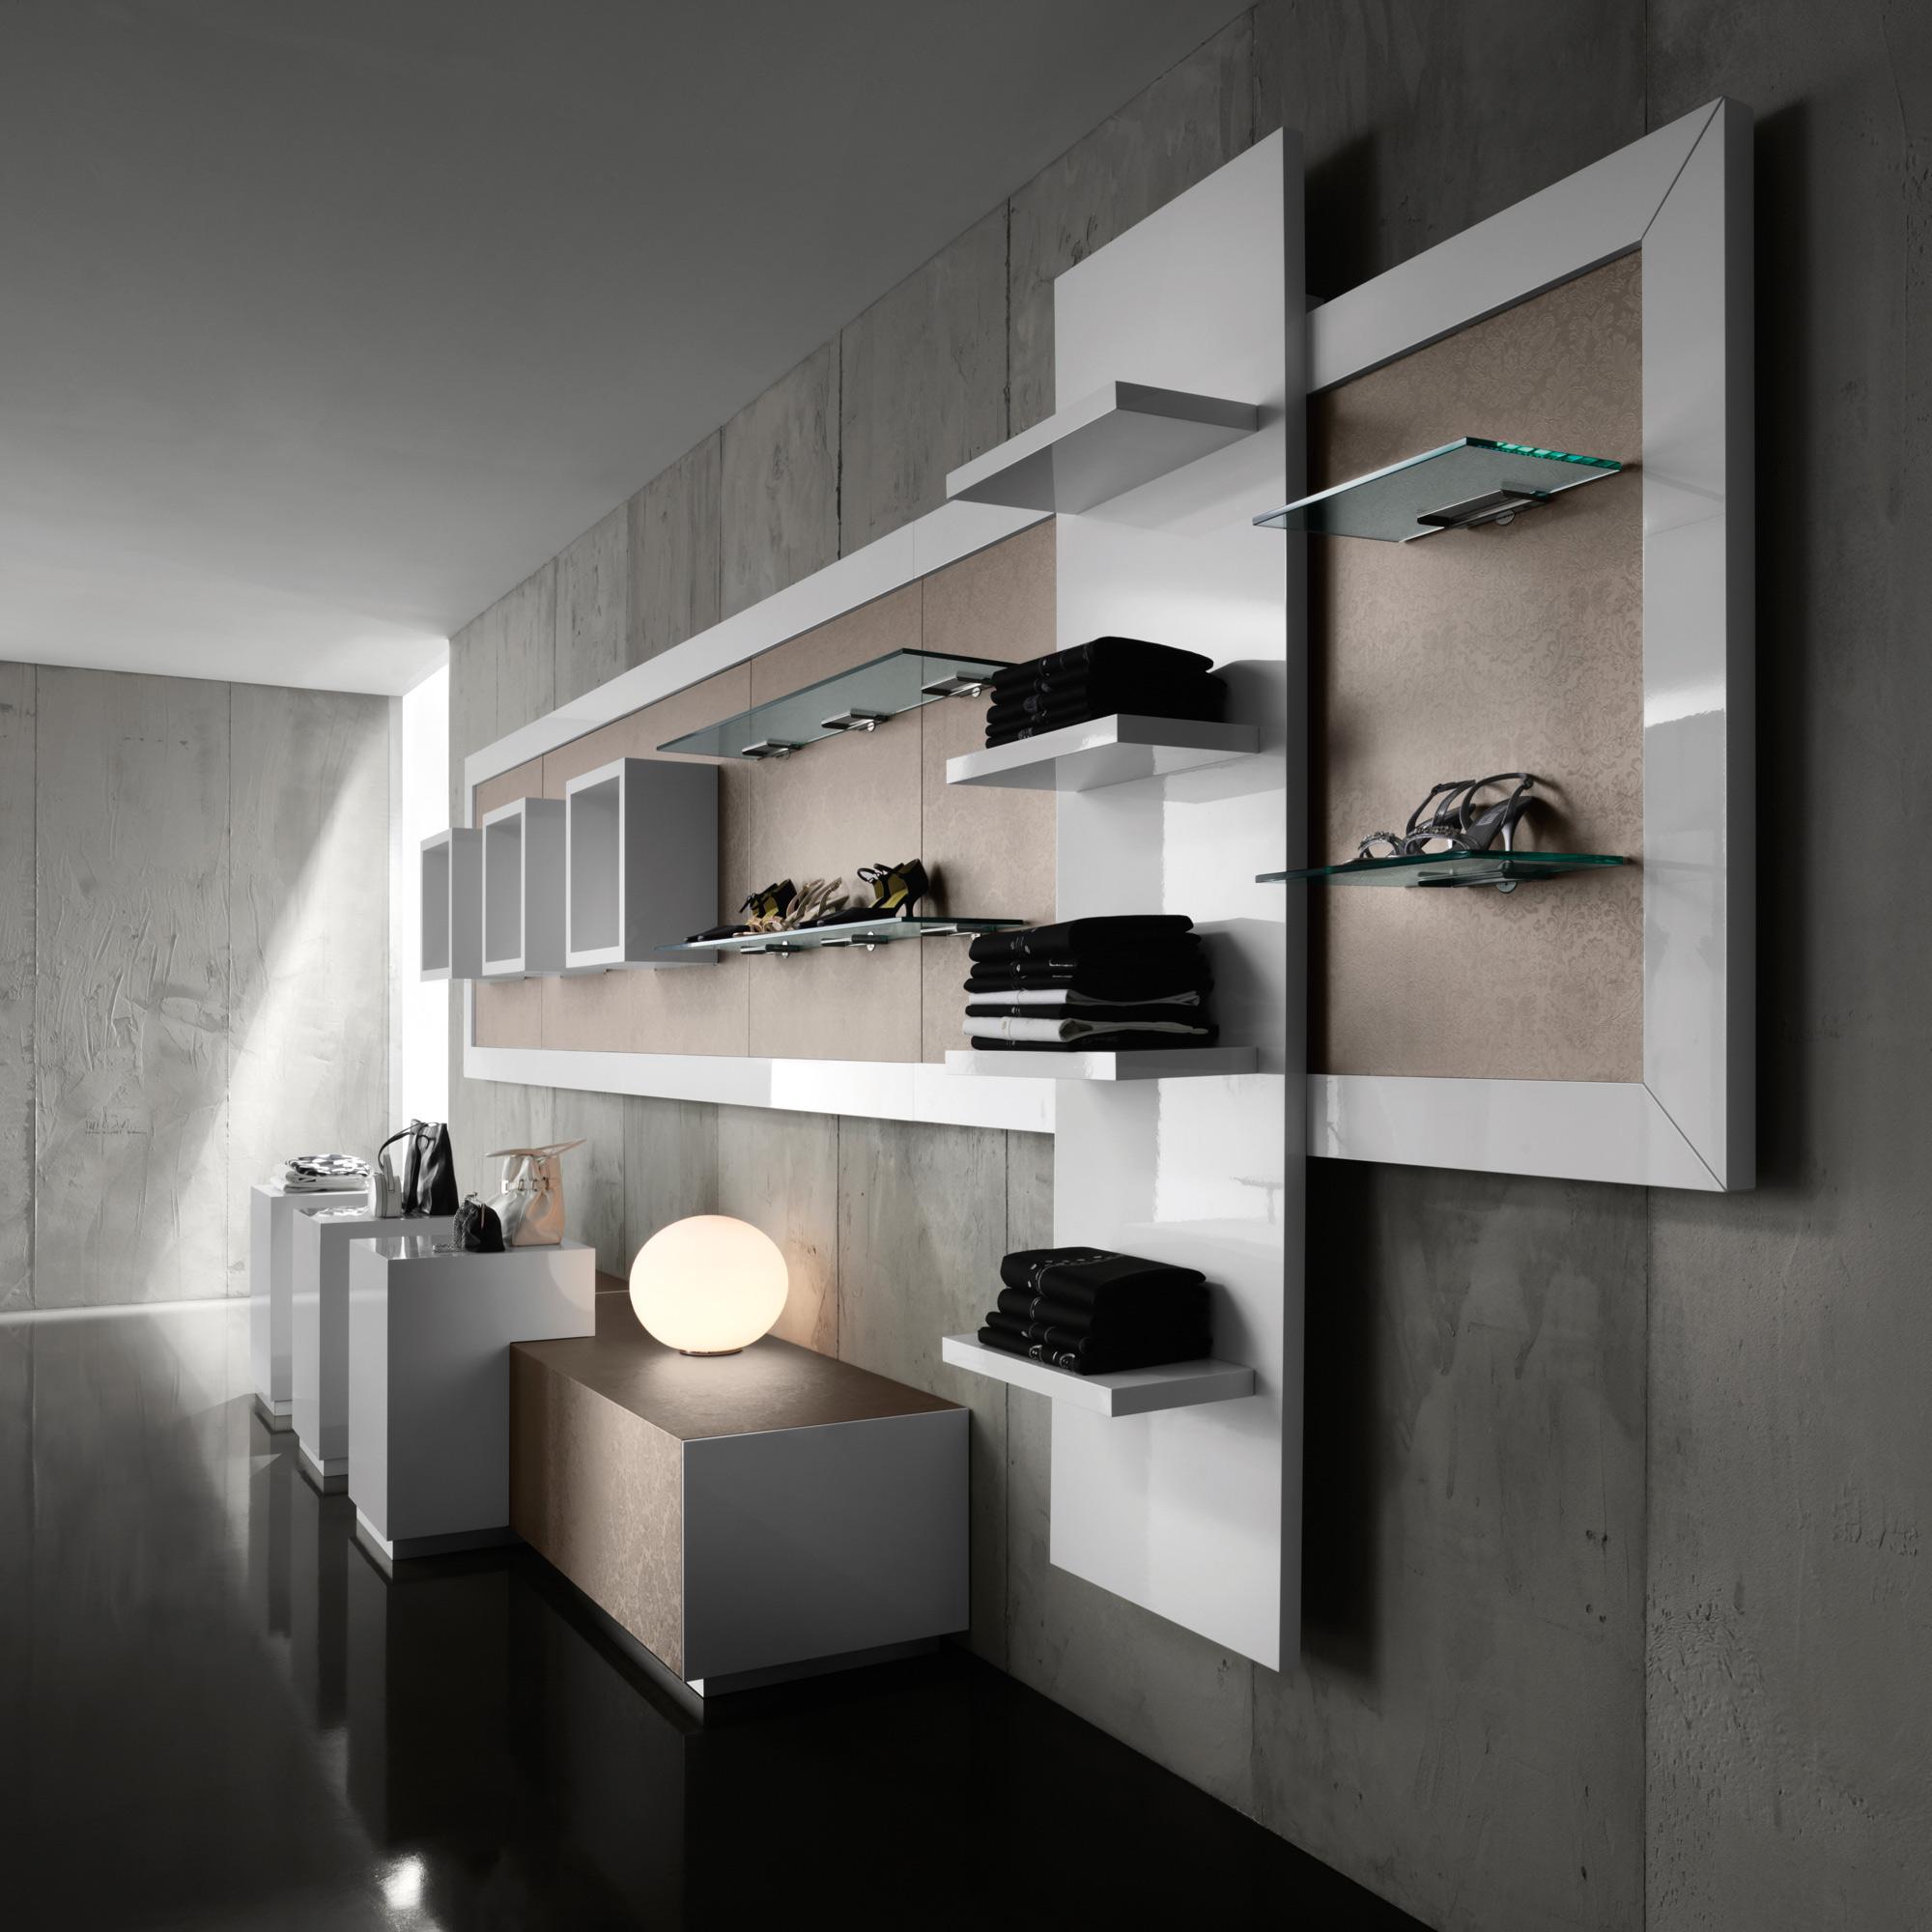 Arredamento per negozi di abbigliamento toscana belardi for Arredamento